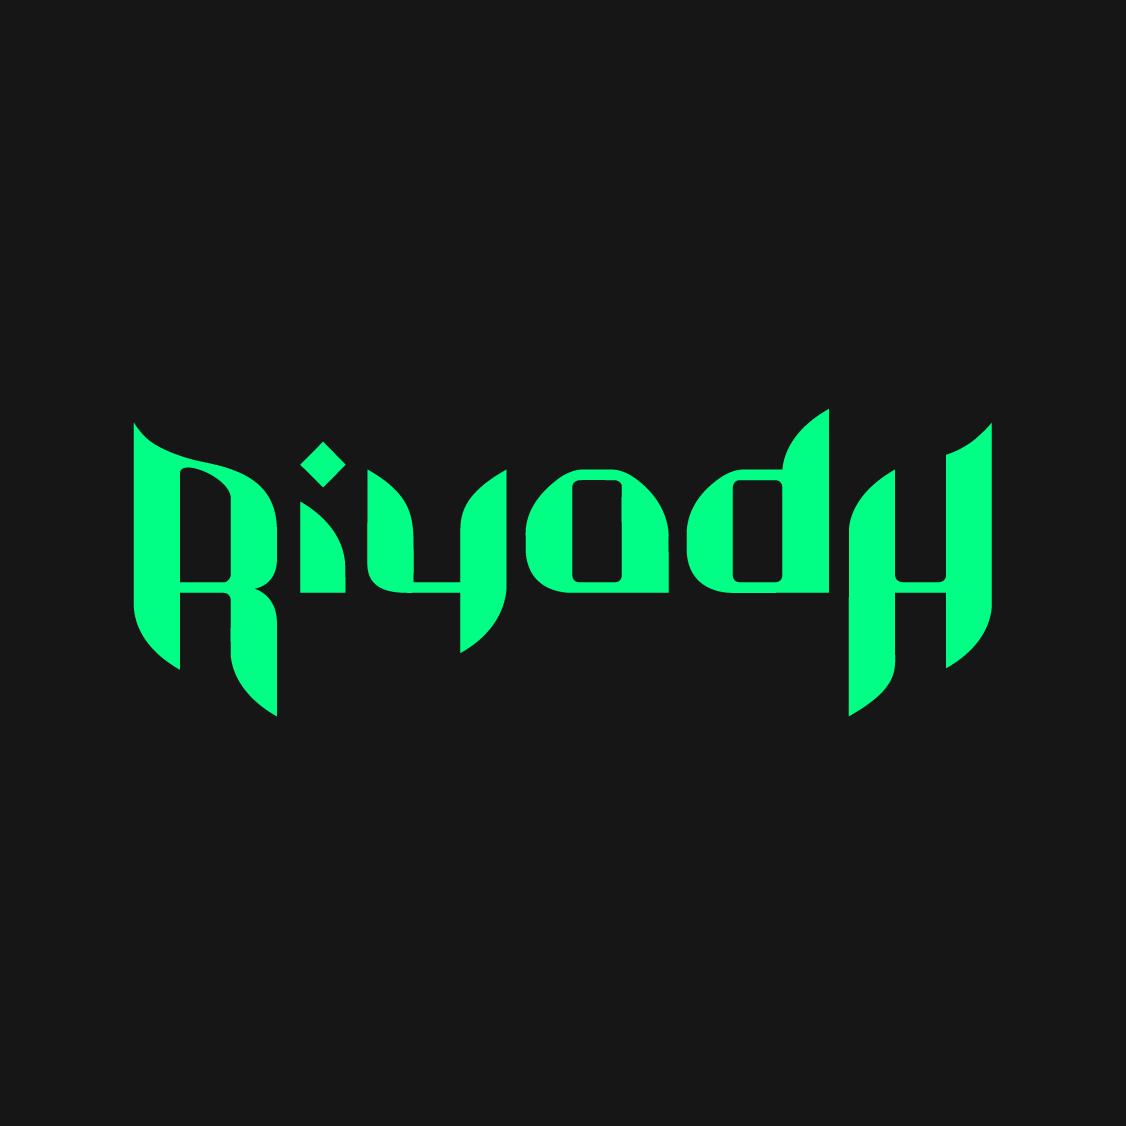 all-logos-2020-67